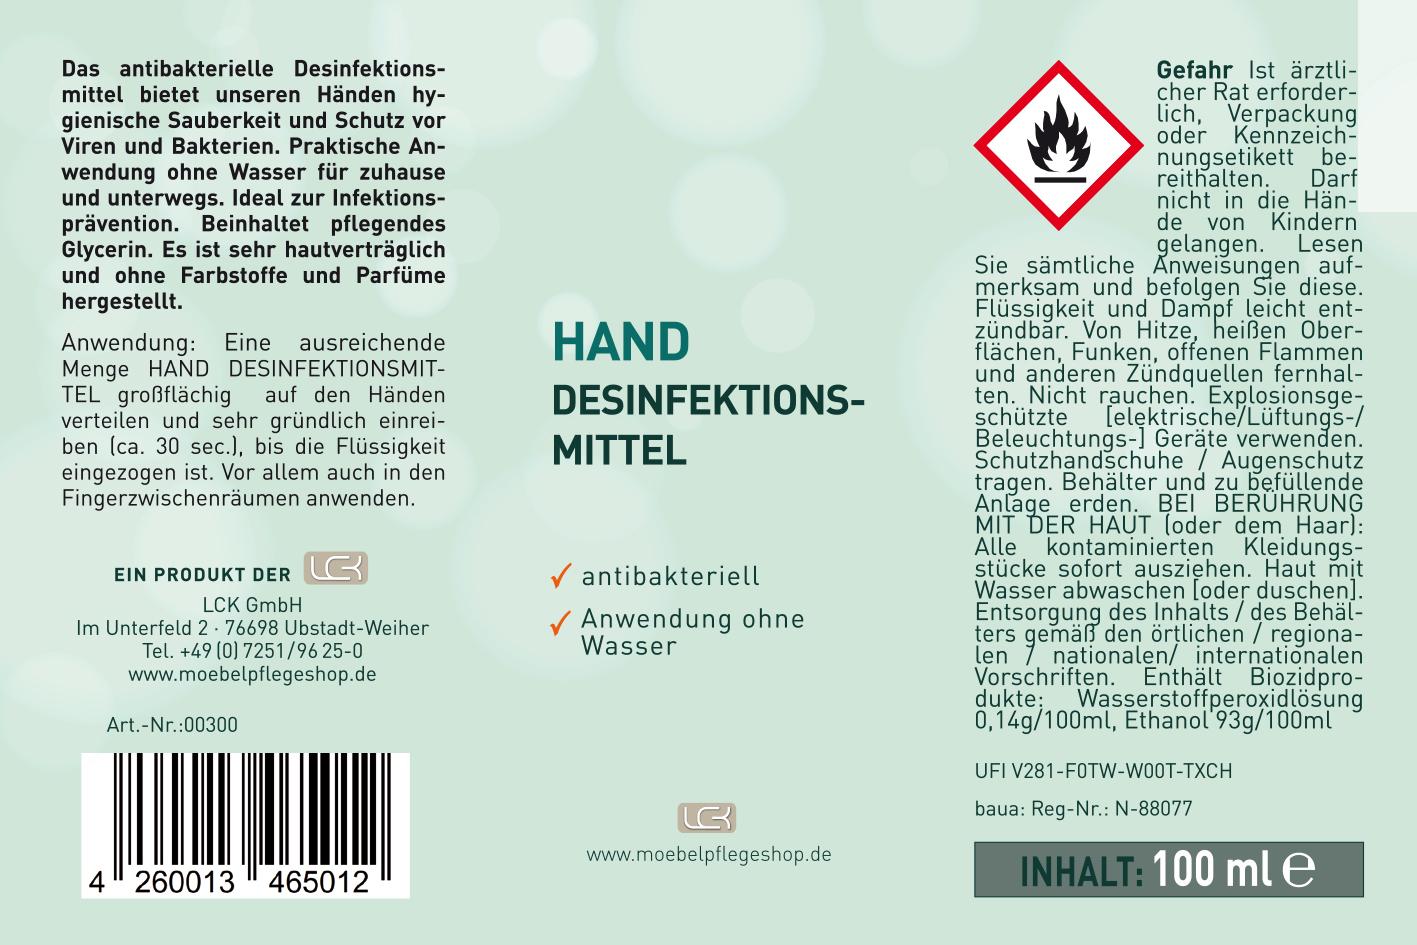 5 x Hand Desinfektionsmittel + Gratis: 5 Atemschutzmasken 2